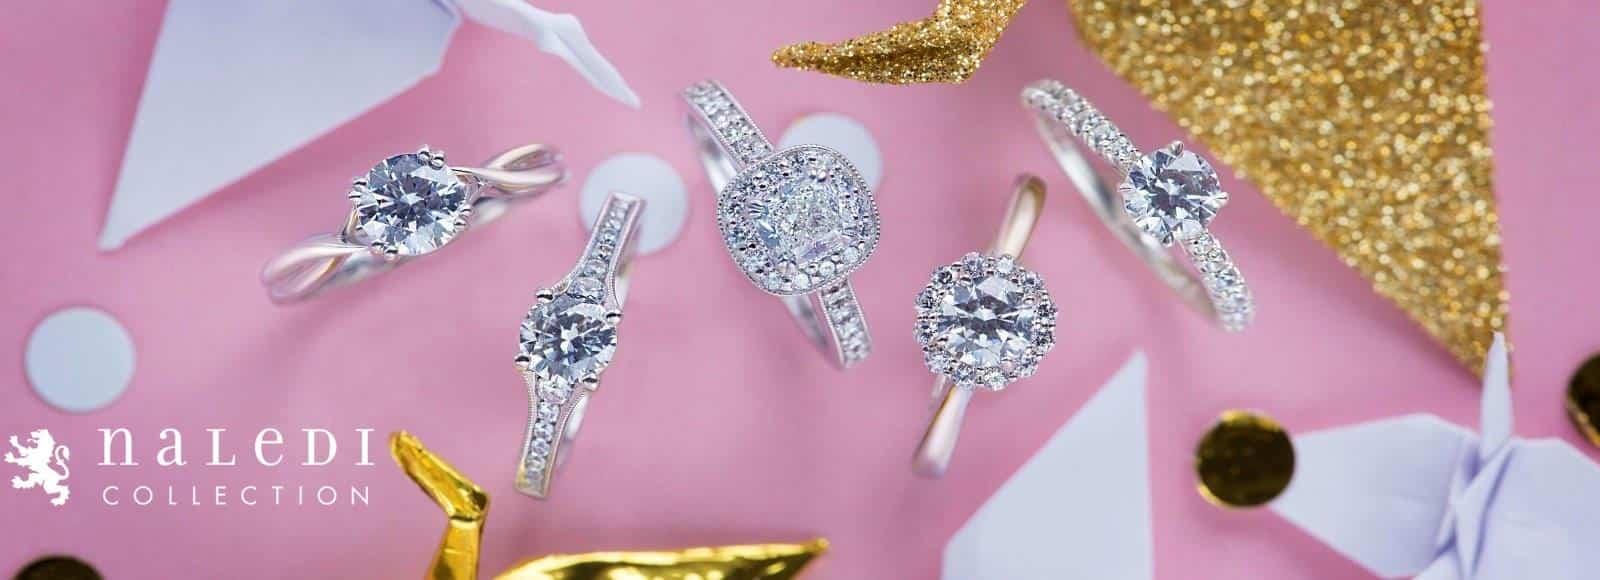 Farnan Jewelers: Your Trusted Source for Diamond & Gemstone Jewelry ...